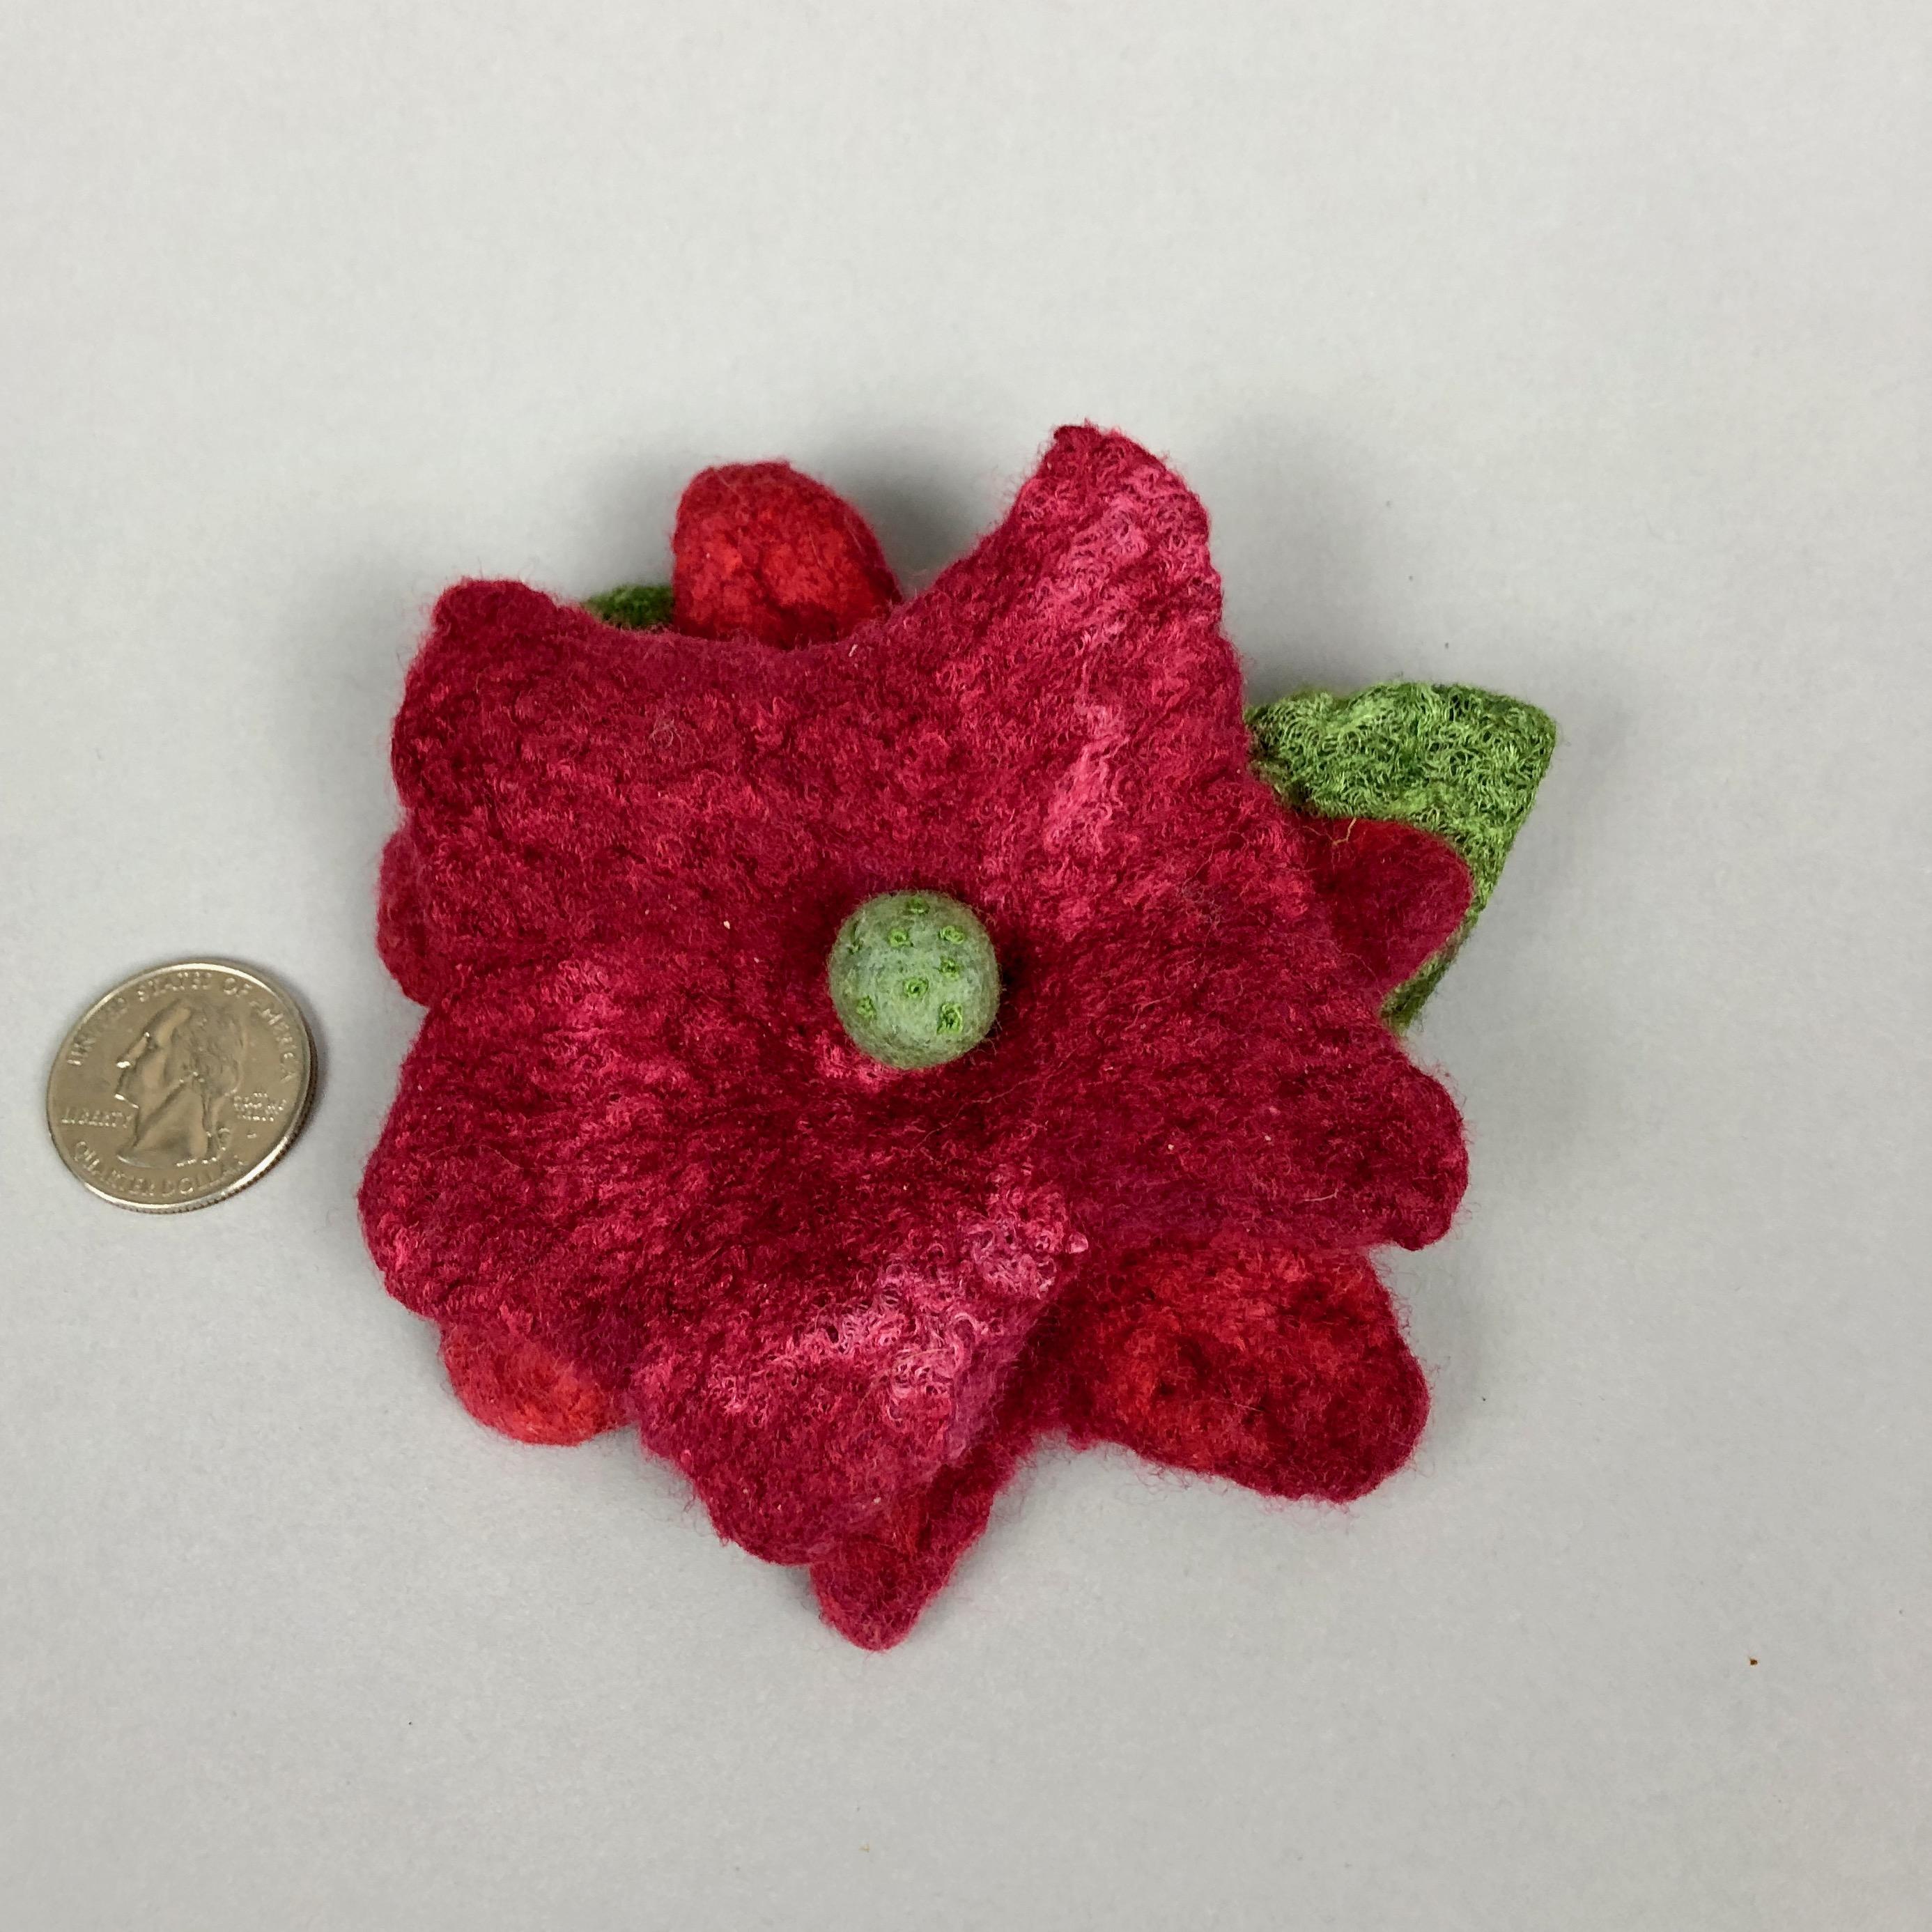 redfeltflowerpin